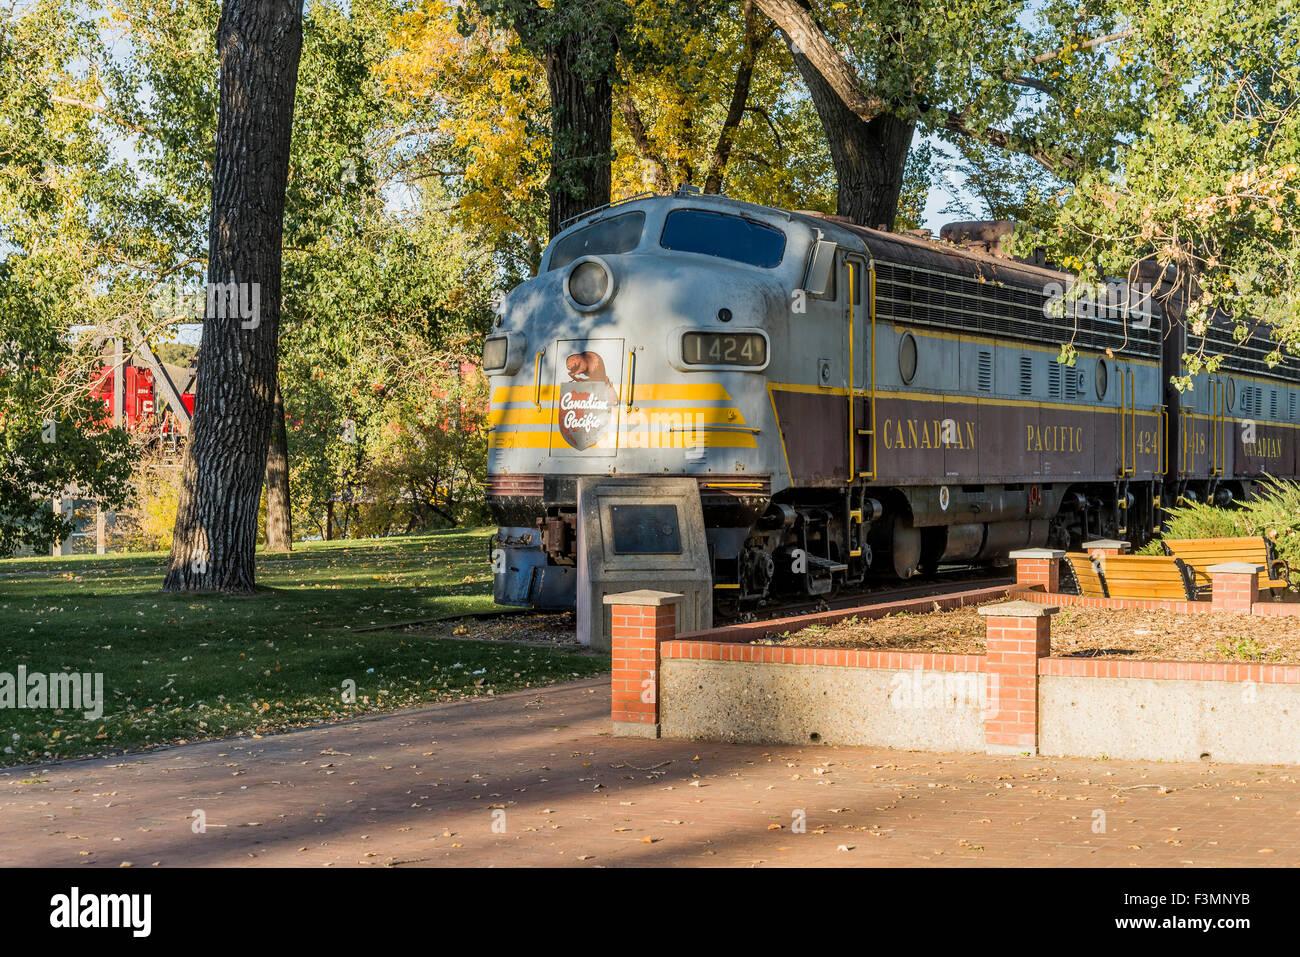 Old Canadian Pacific locomotive, Medicine Hat, Alberta, Canada - Stock Image